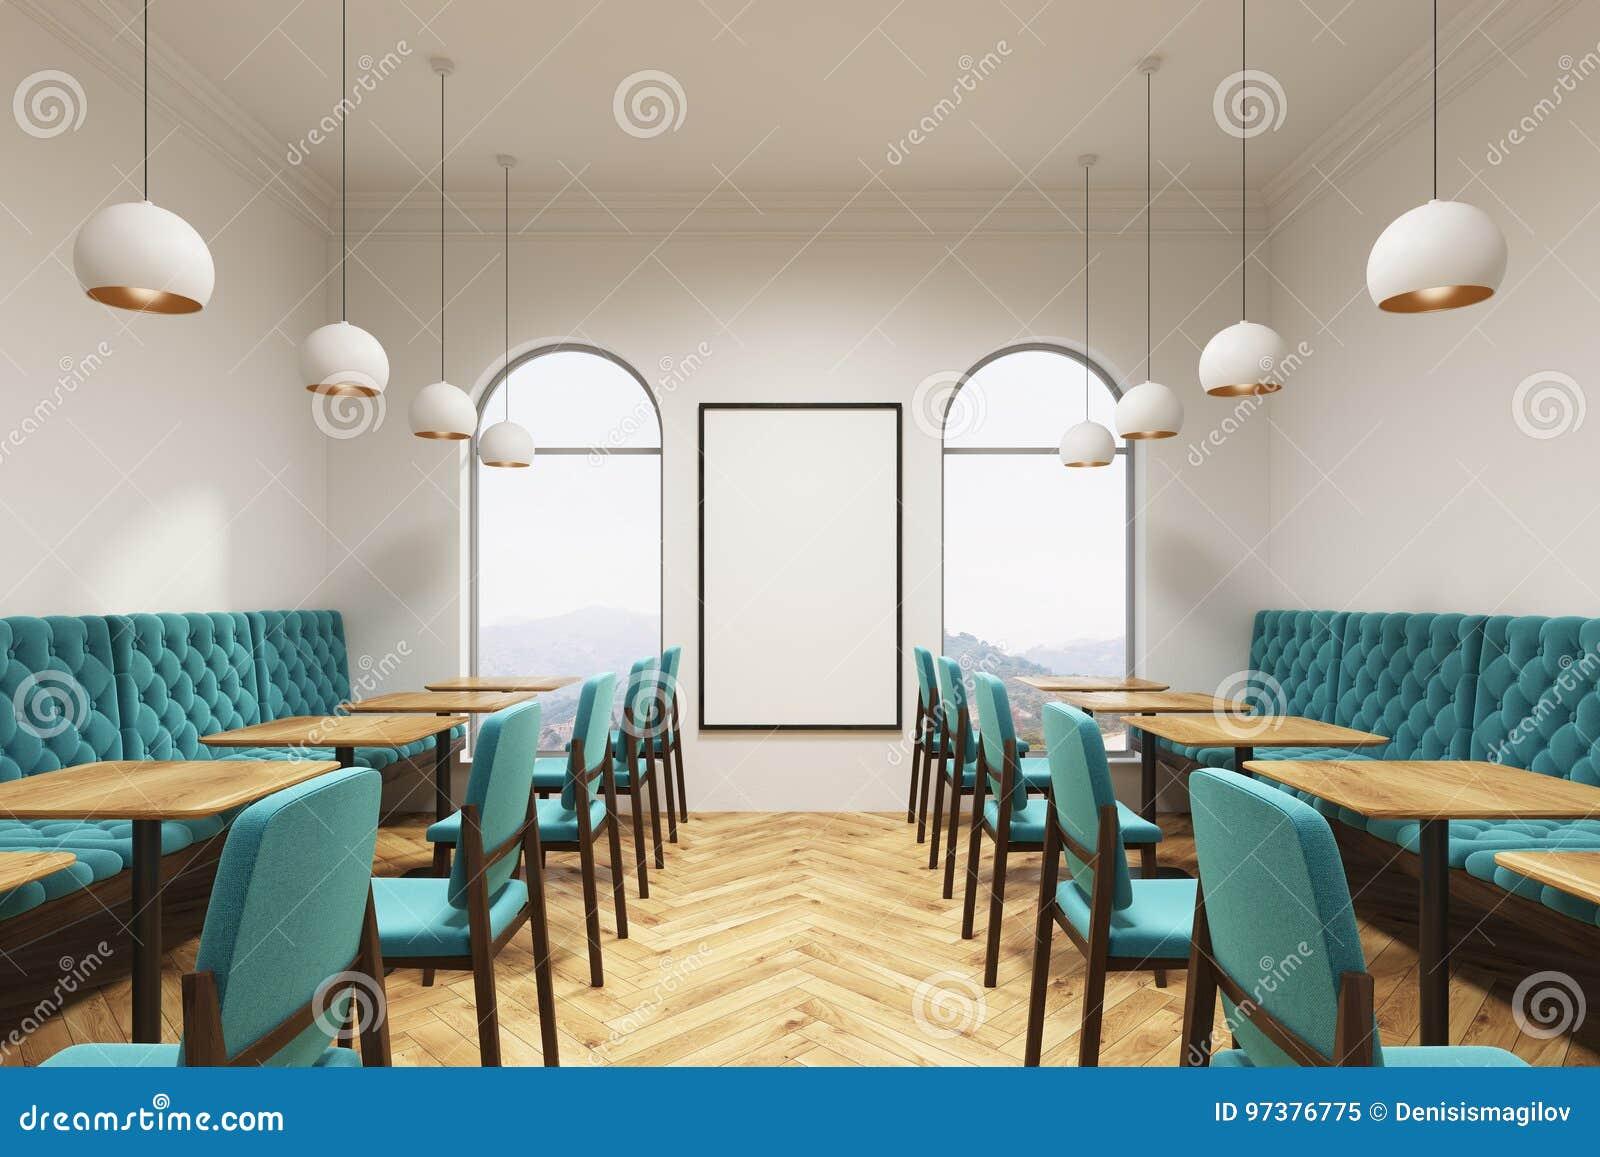 Blue Green Cafe Interior Poster Stock Illustration Illustration Of Banner Background 97376775